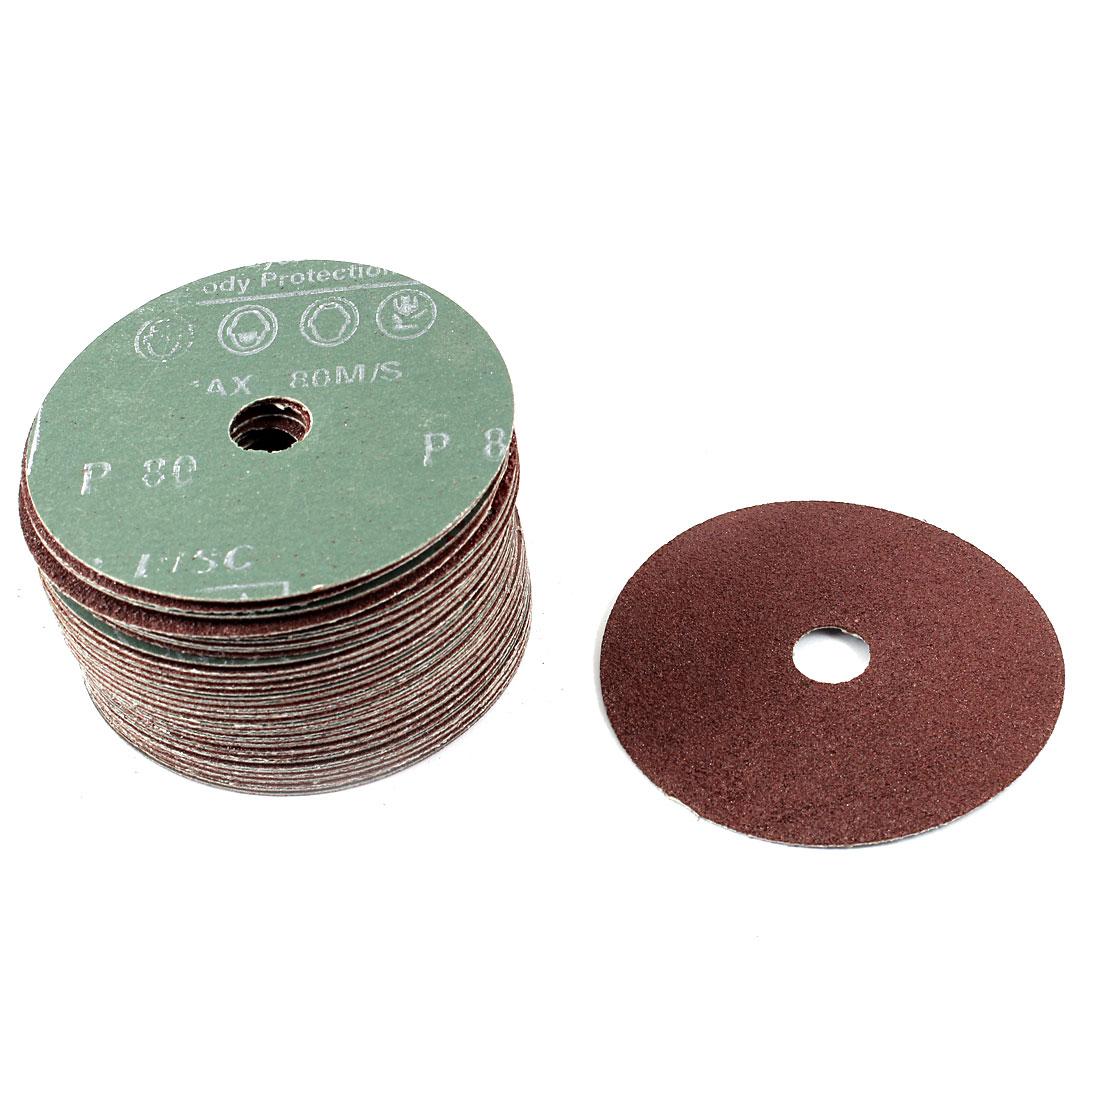 P80 Slice Grinding Disc Cutting Wheel Tool 100mm x 16mm x 1mm 50pcs